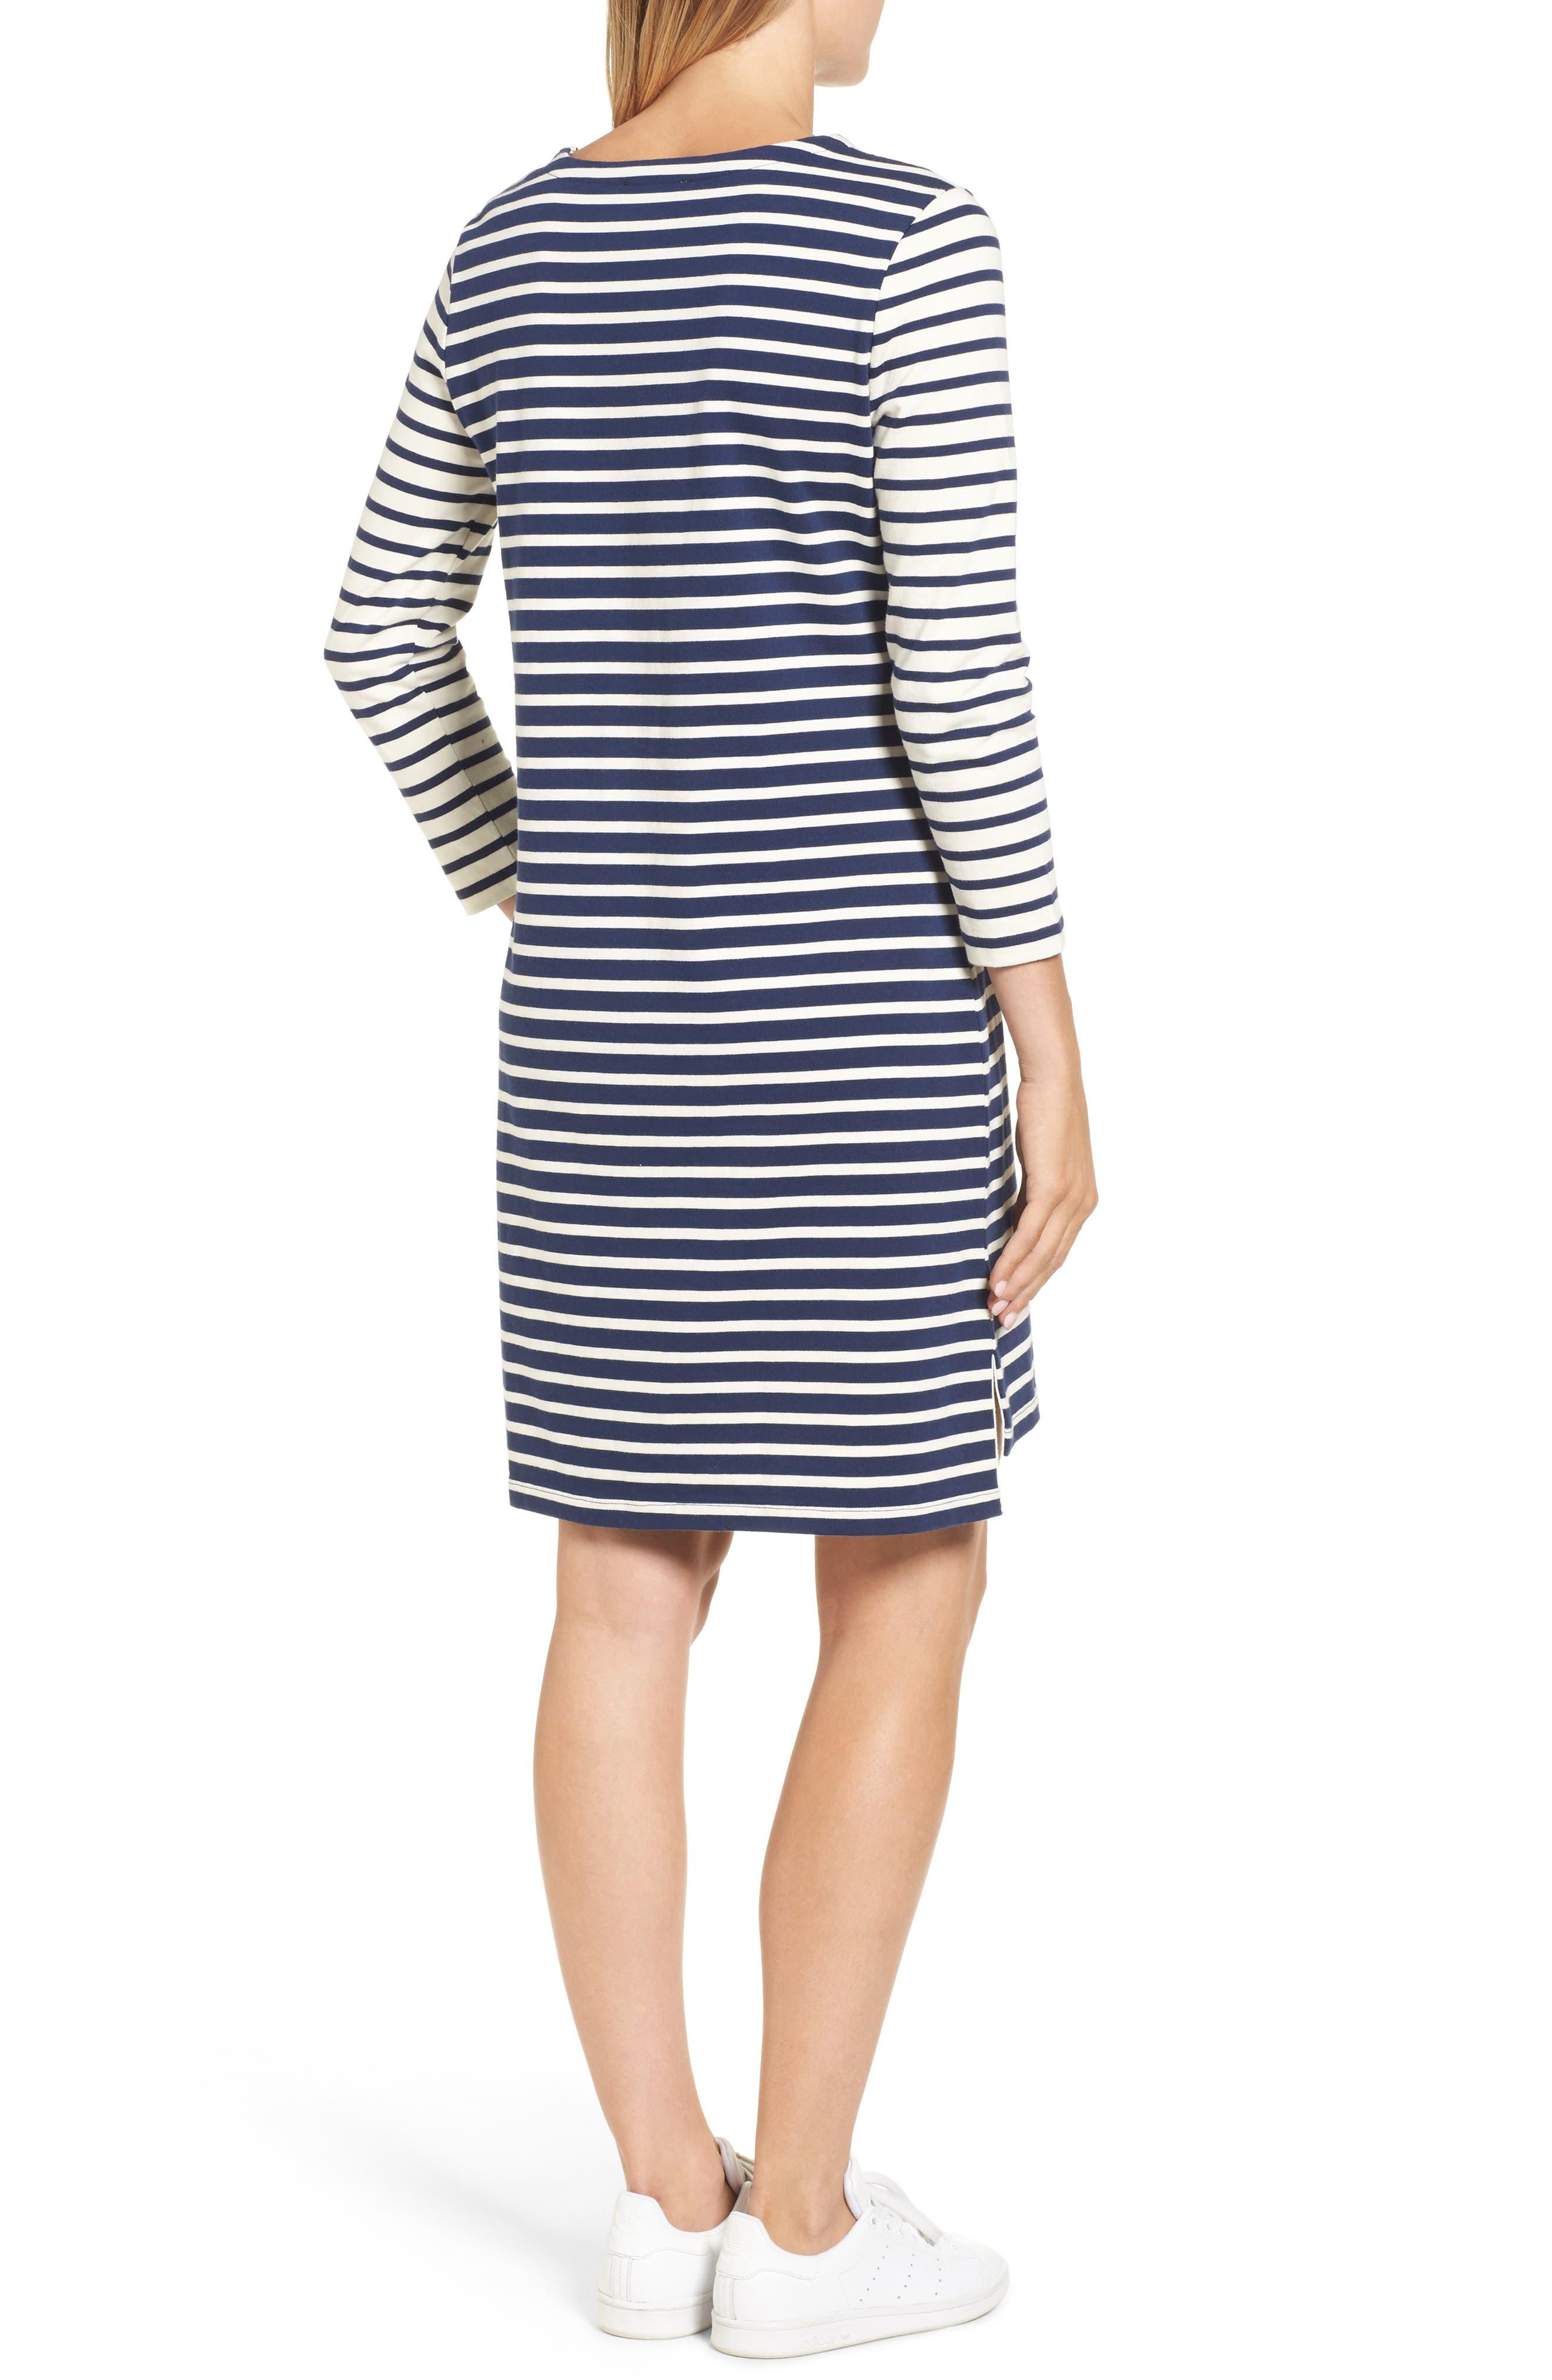 Alternate Image 2  - vineyard vines Mixed Stripe Knit Dress